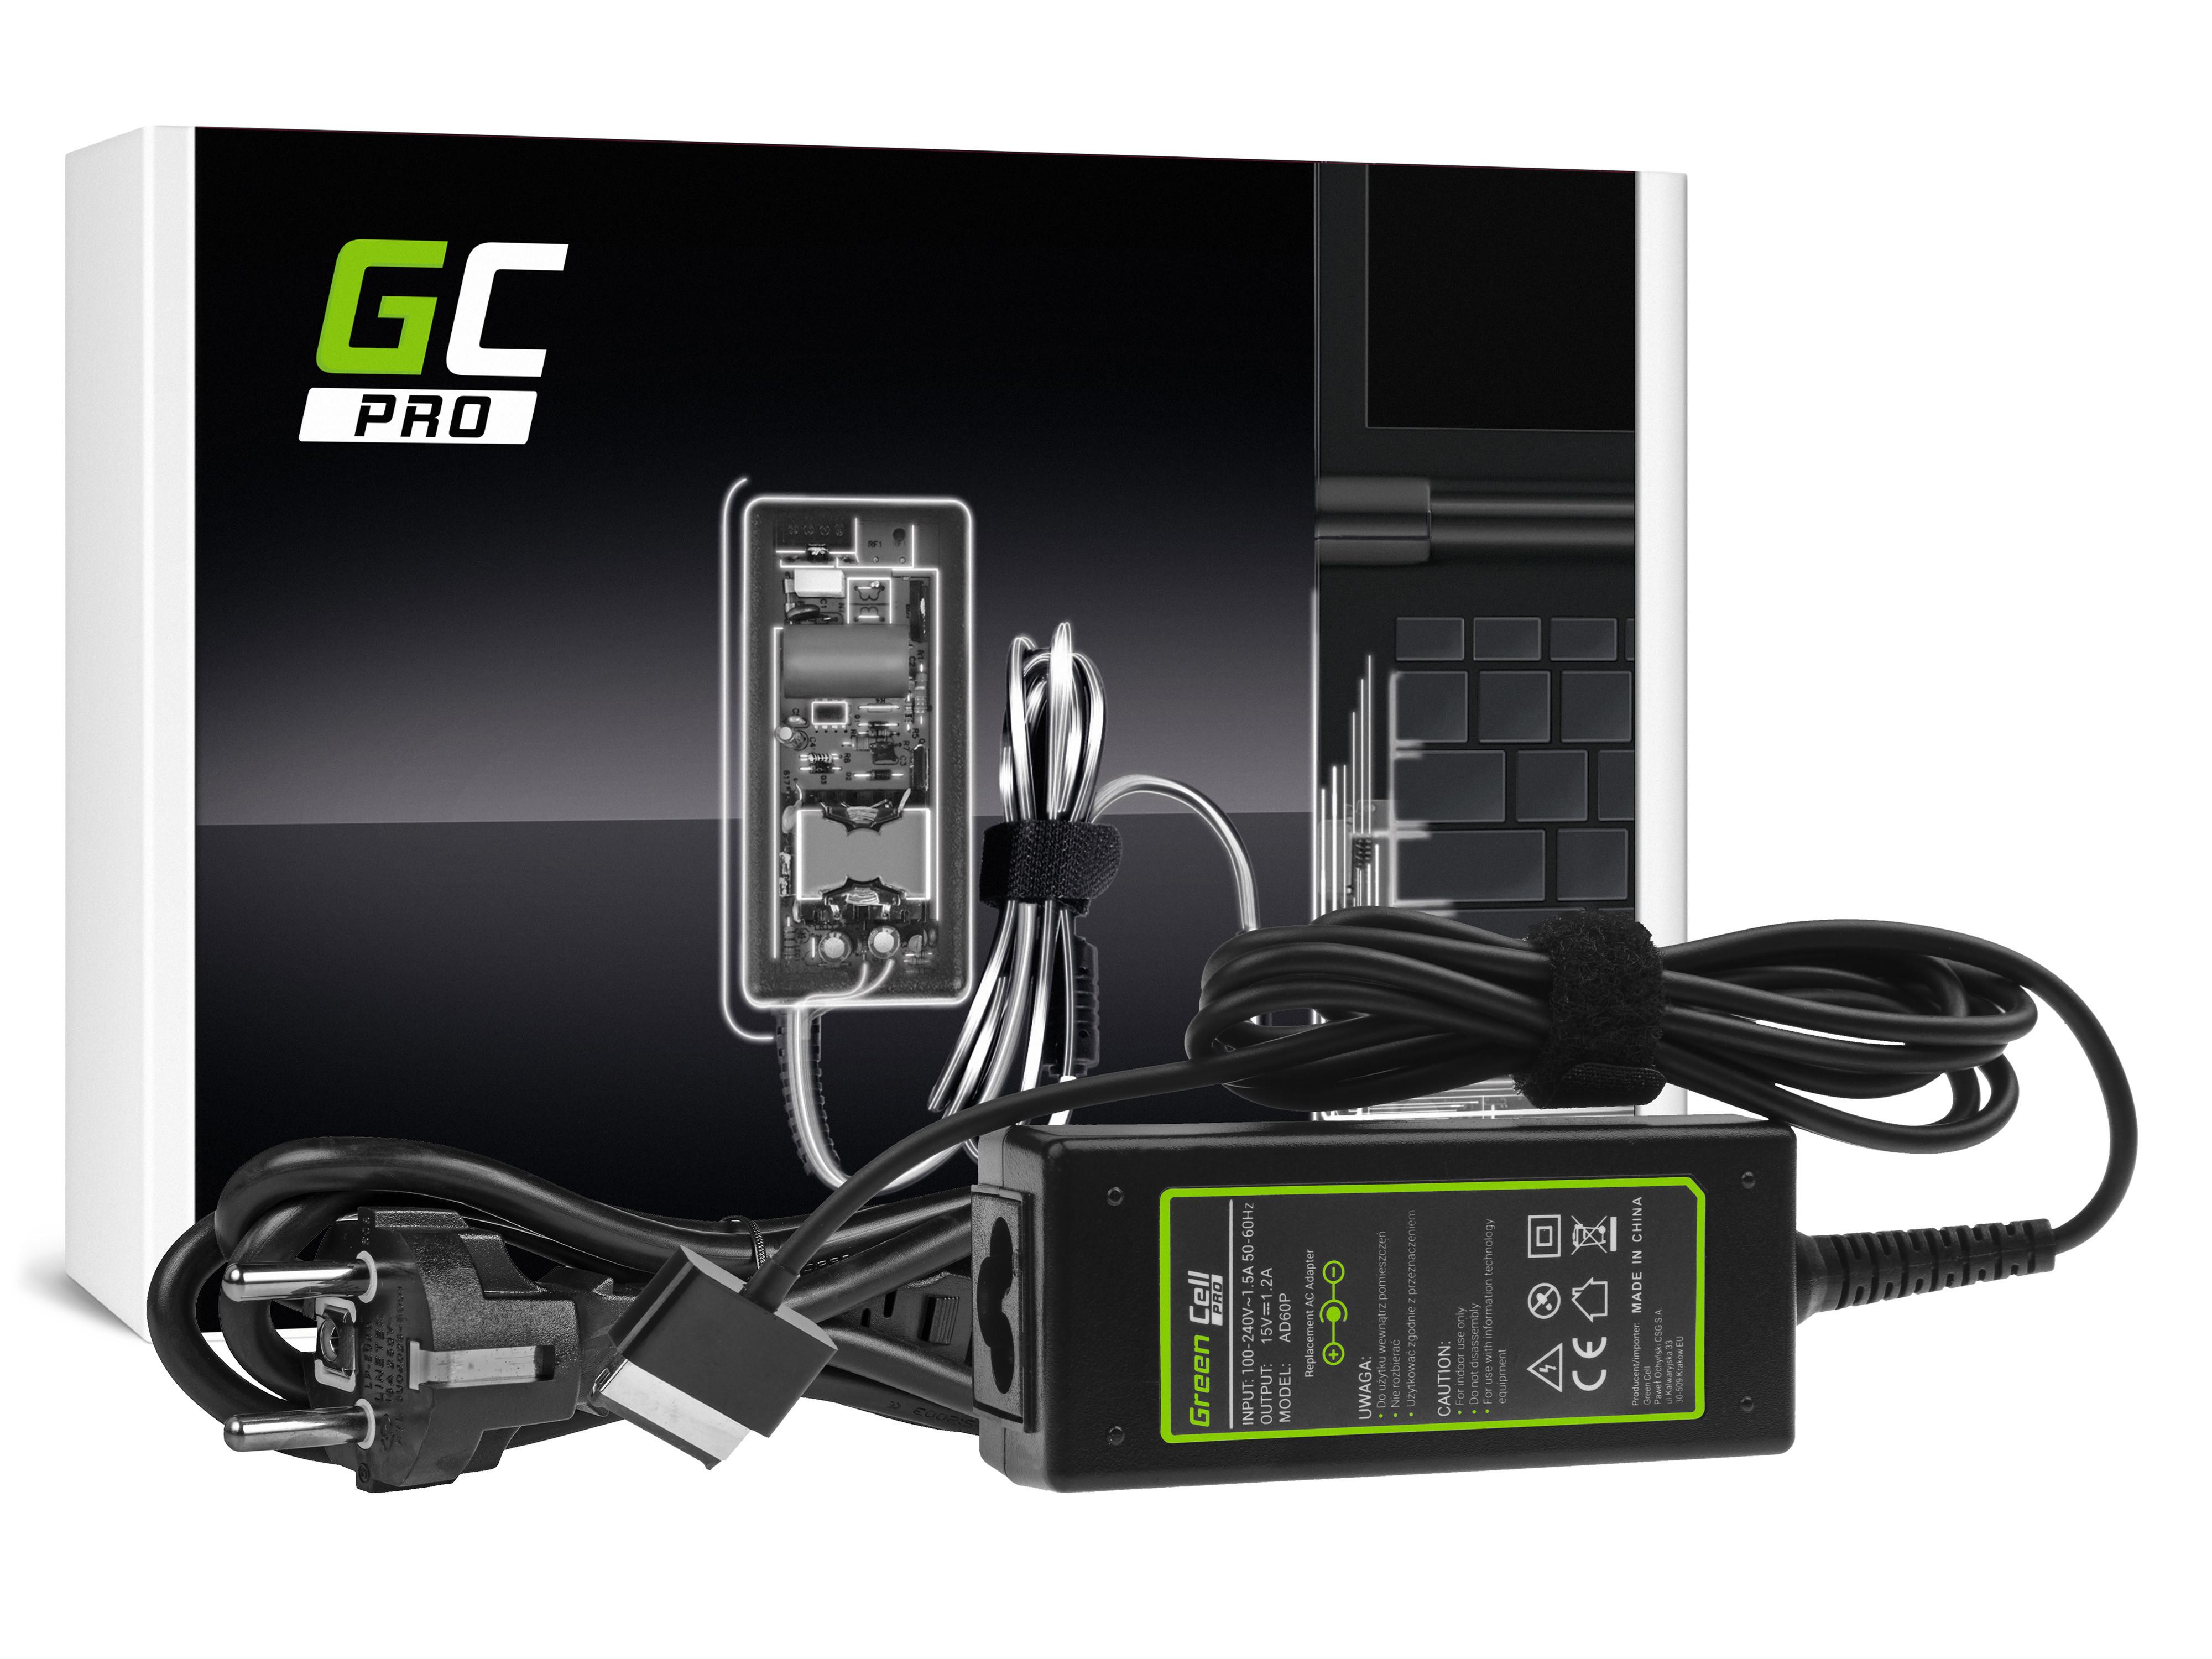 Green Cell AD60P Nabíječka Adaptér pro Asus Eee Pad Transformer TF101 TF201 TF300 TF300T TF300TG 15V 1.2A 18W